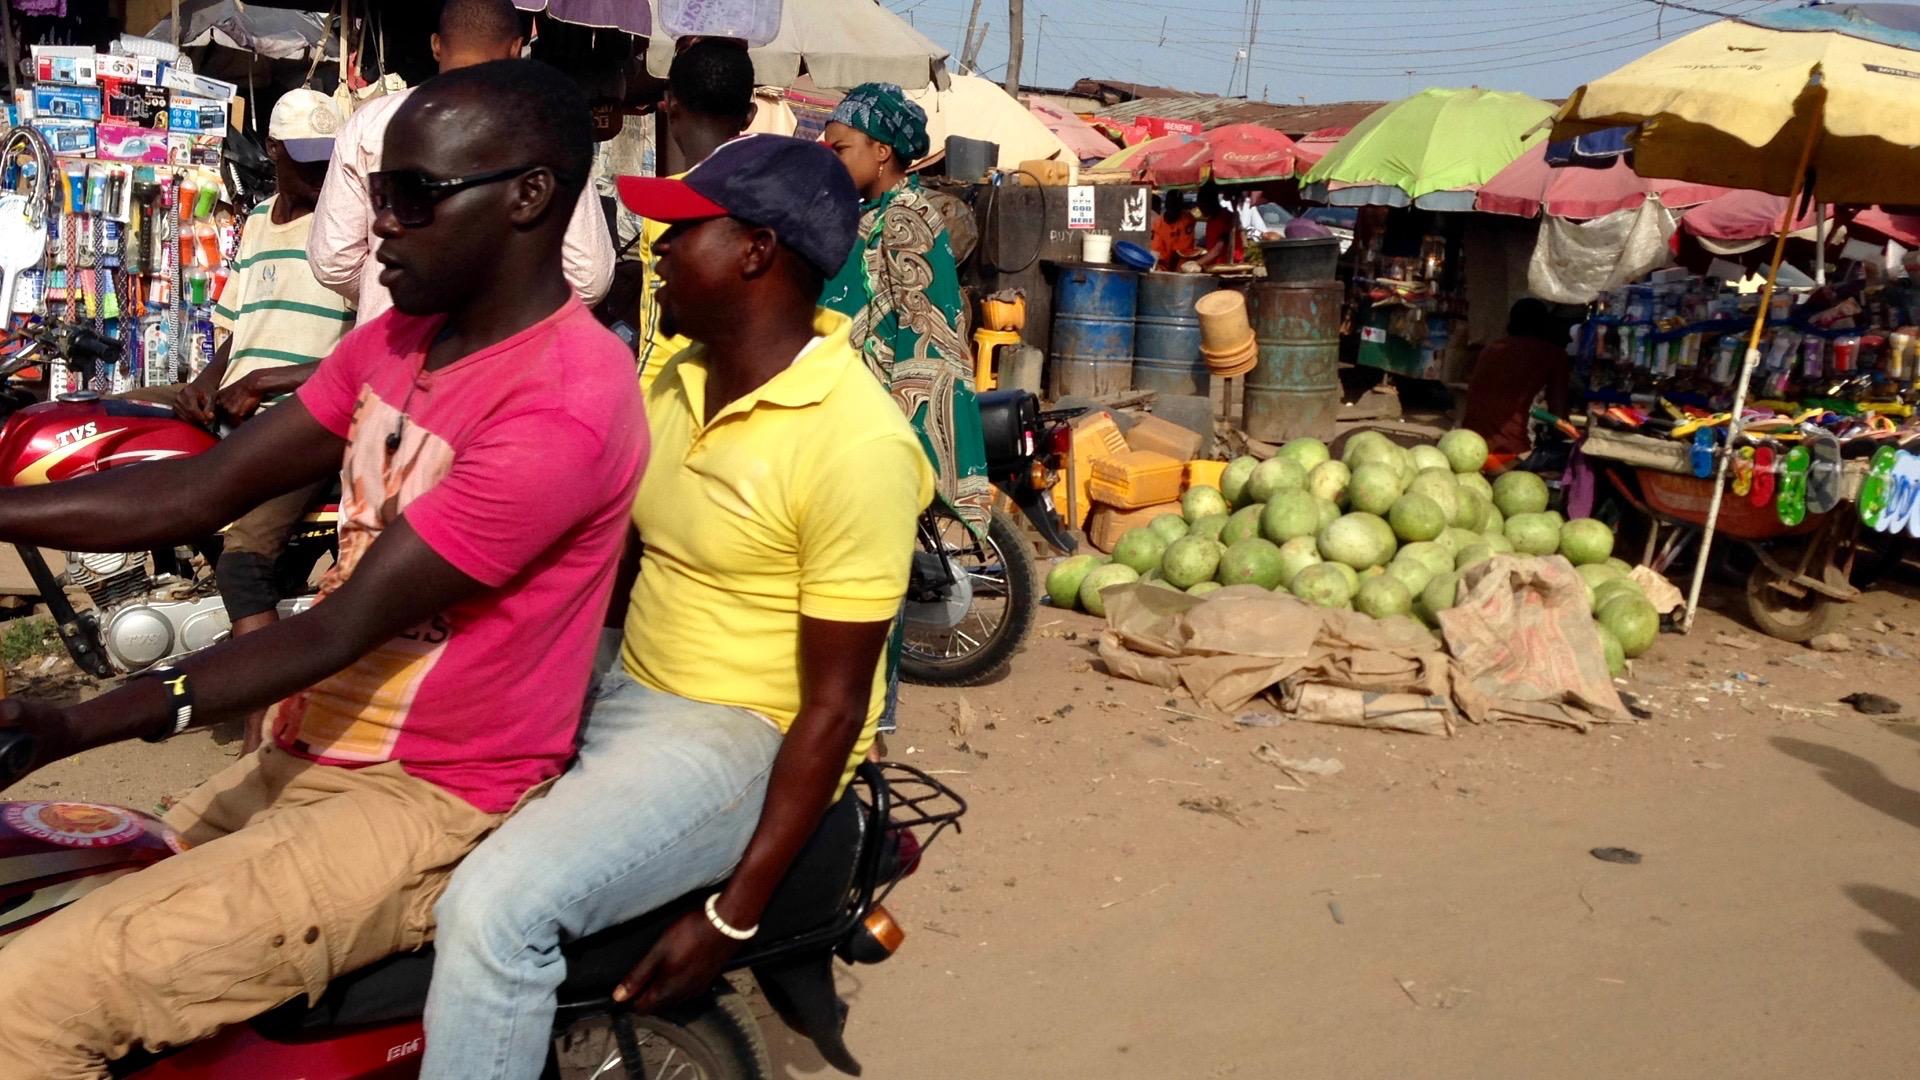 Market scene in Kubwa, Abuja, Nigeria. #JujuFilms